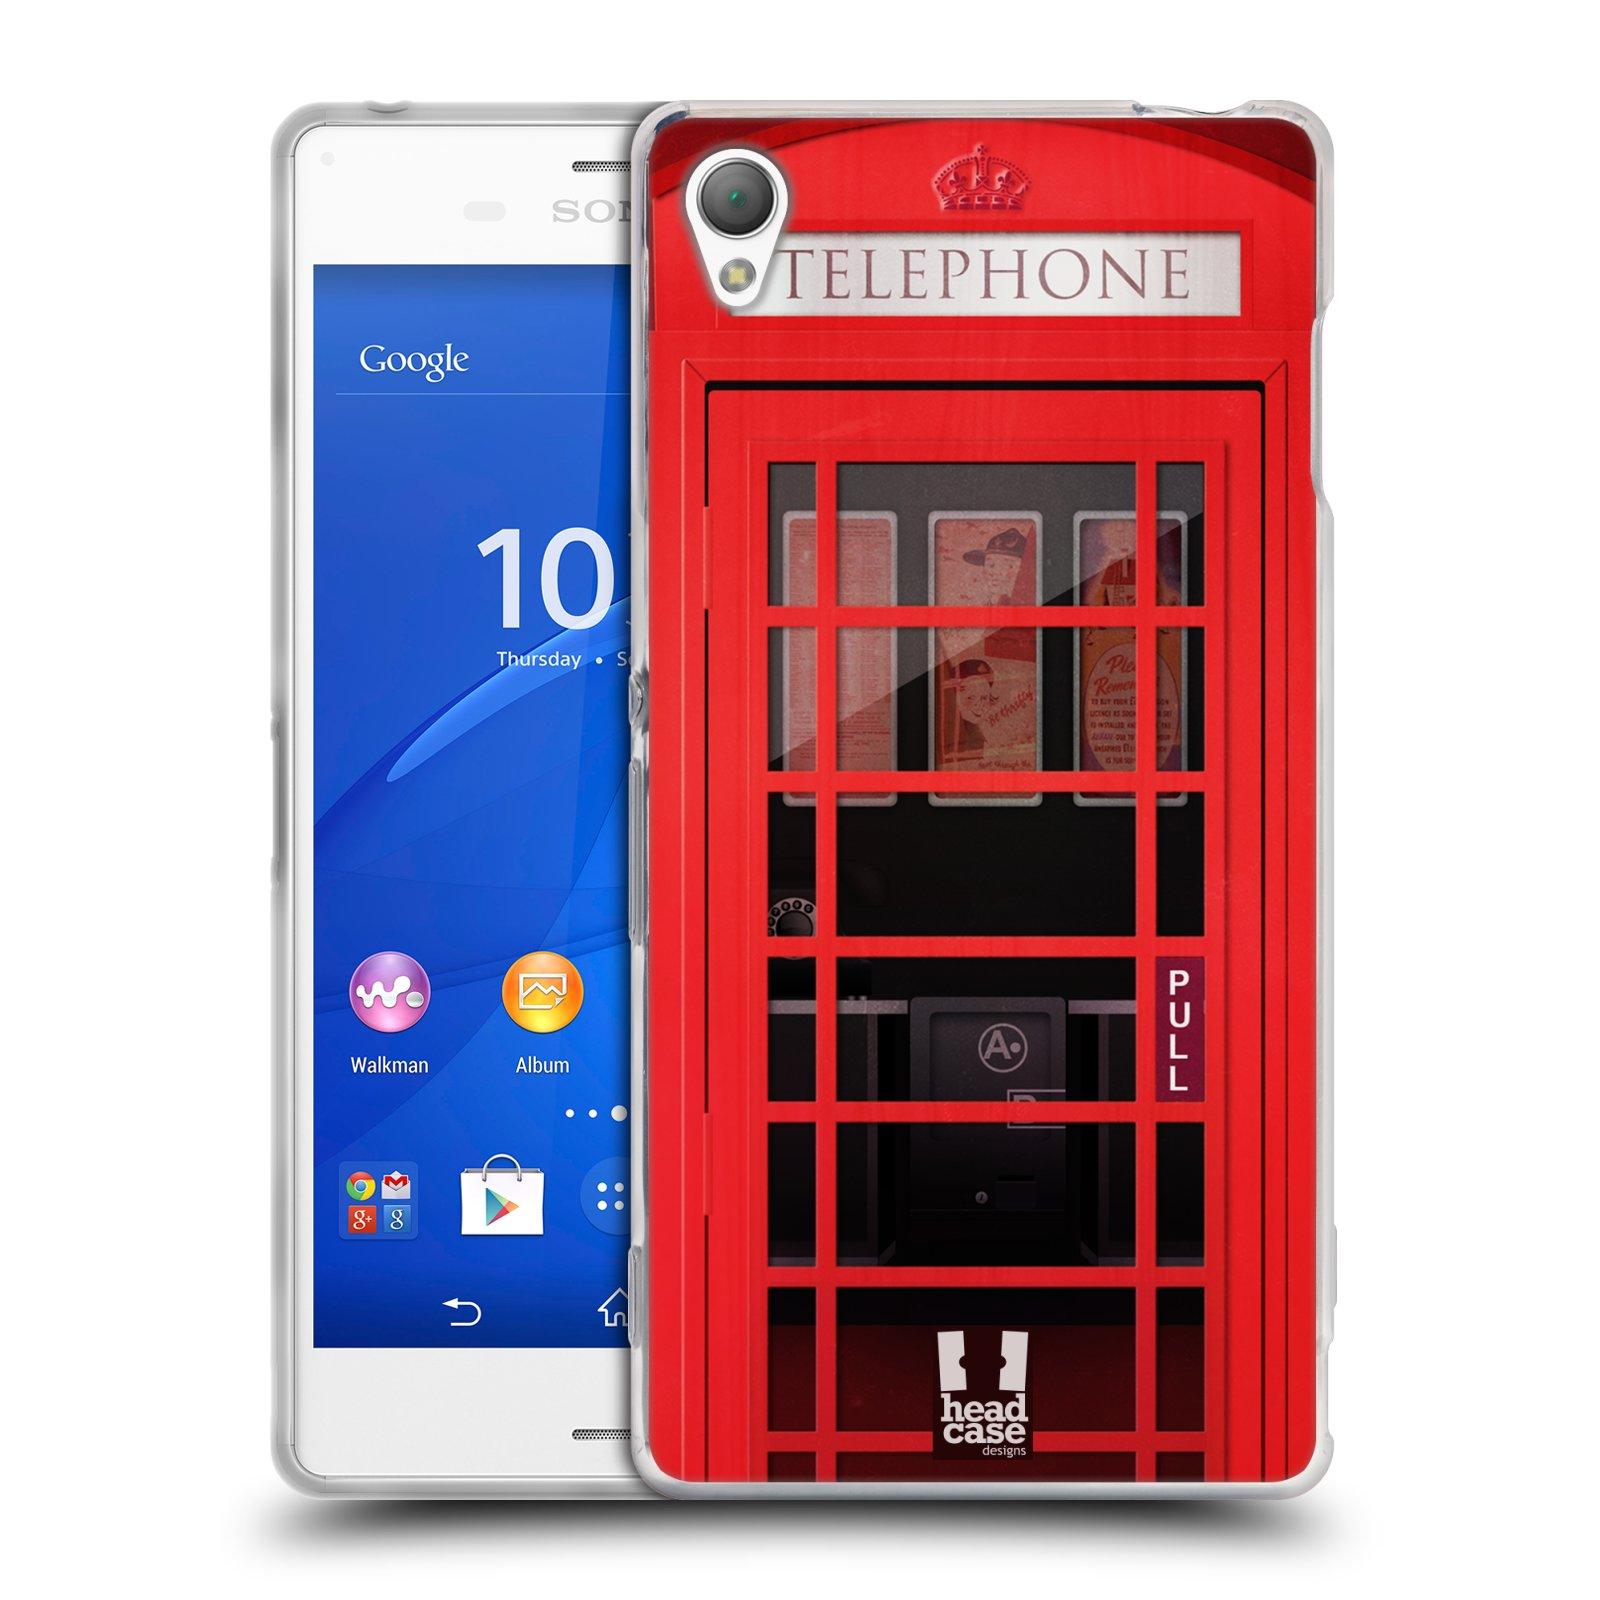 Silikonové pouzdro na mobil Sony Xperia Z3 D6603 HEAD CASE TELEFONNÍ BUDKA